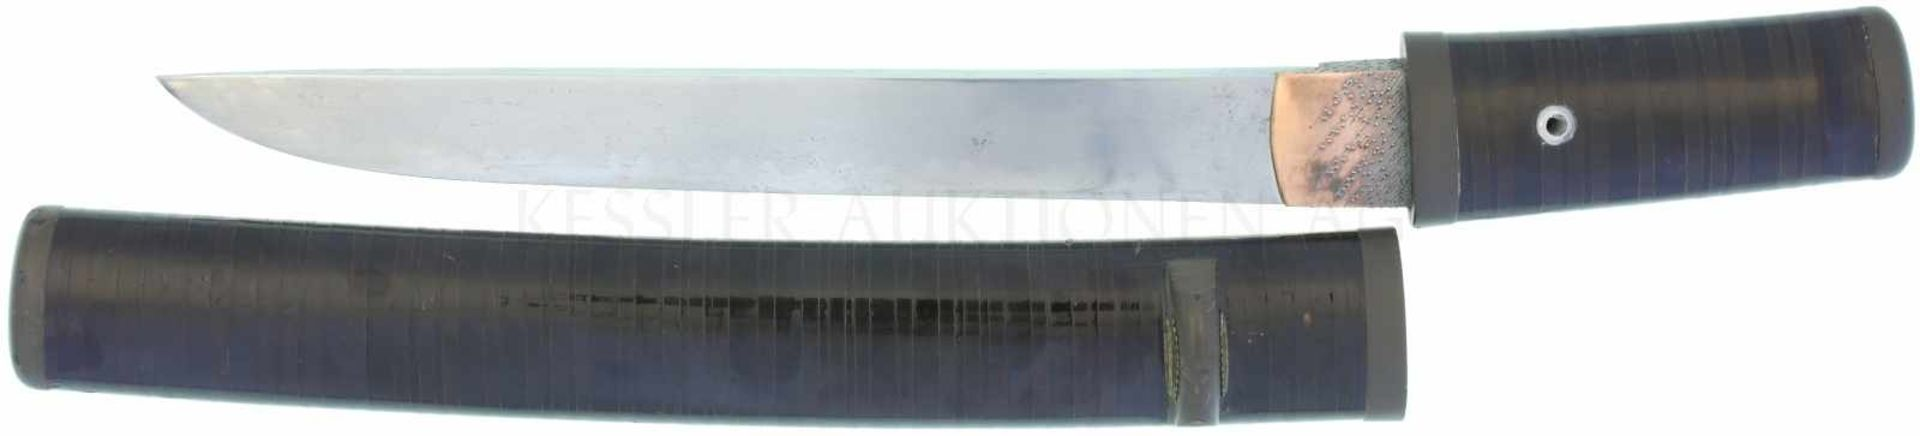 Los 10 - Aikuchi Yoroi-doshi Edo-Periode um 1850 KL 224mm, TL 313mm, handgeschmiedete Klinge aus gefaltetem